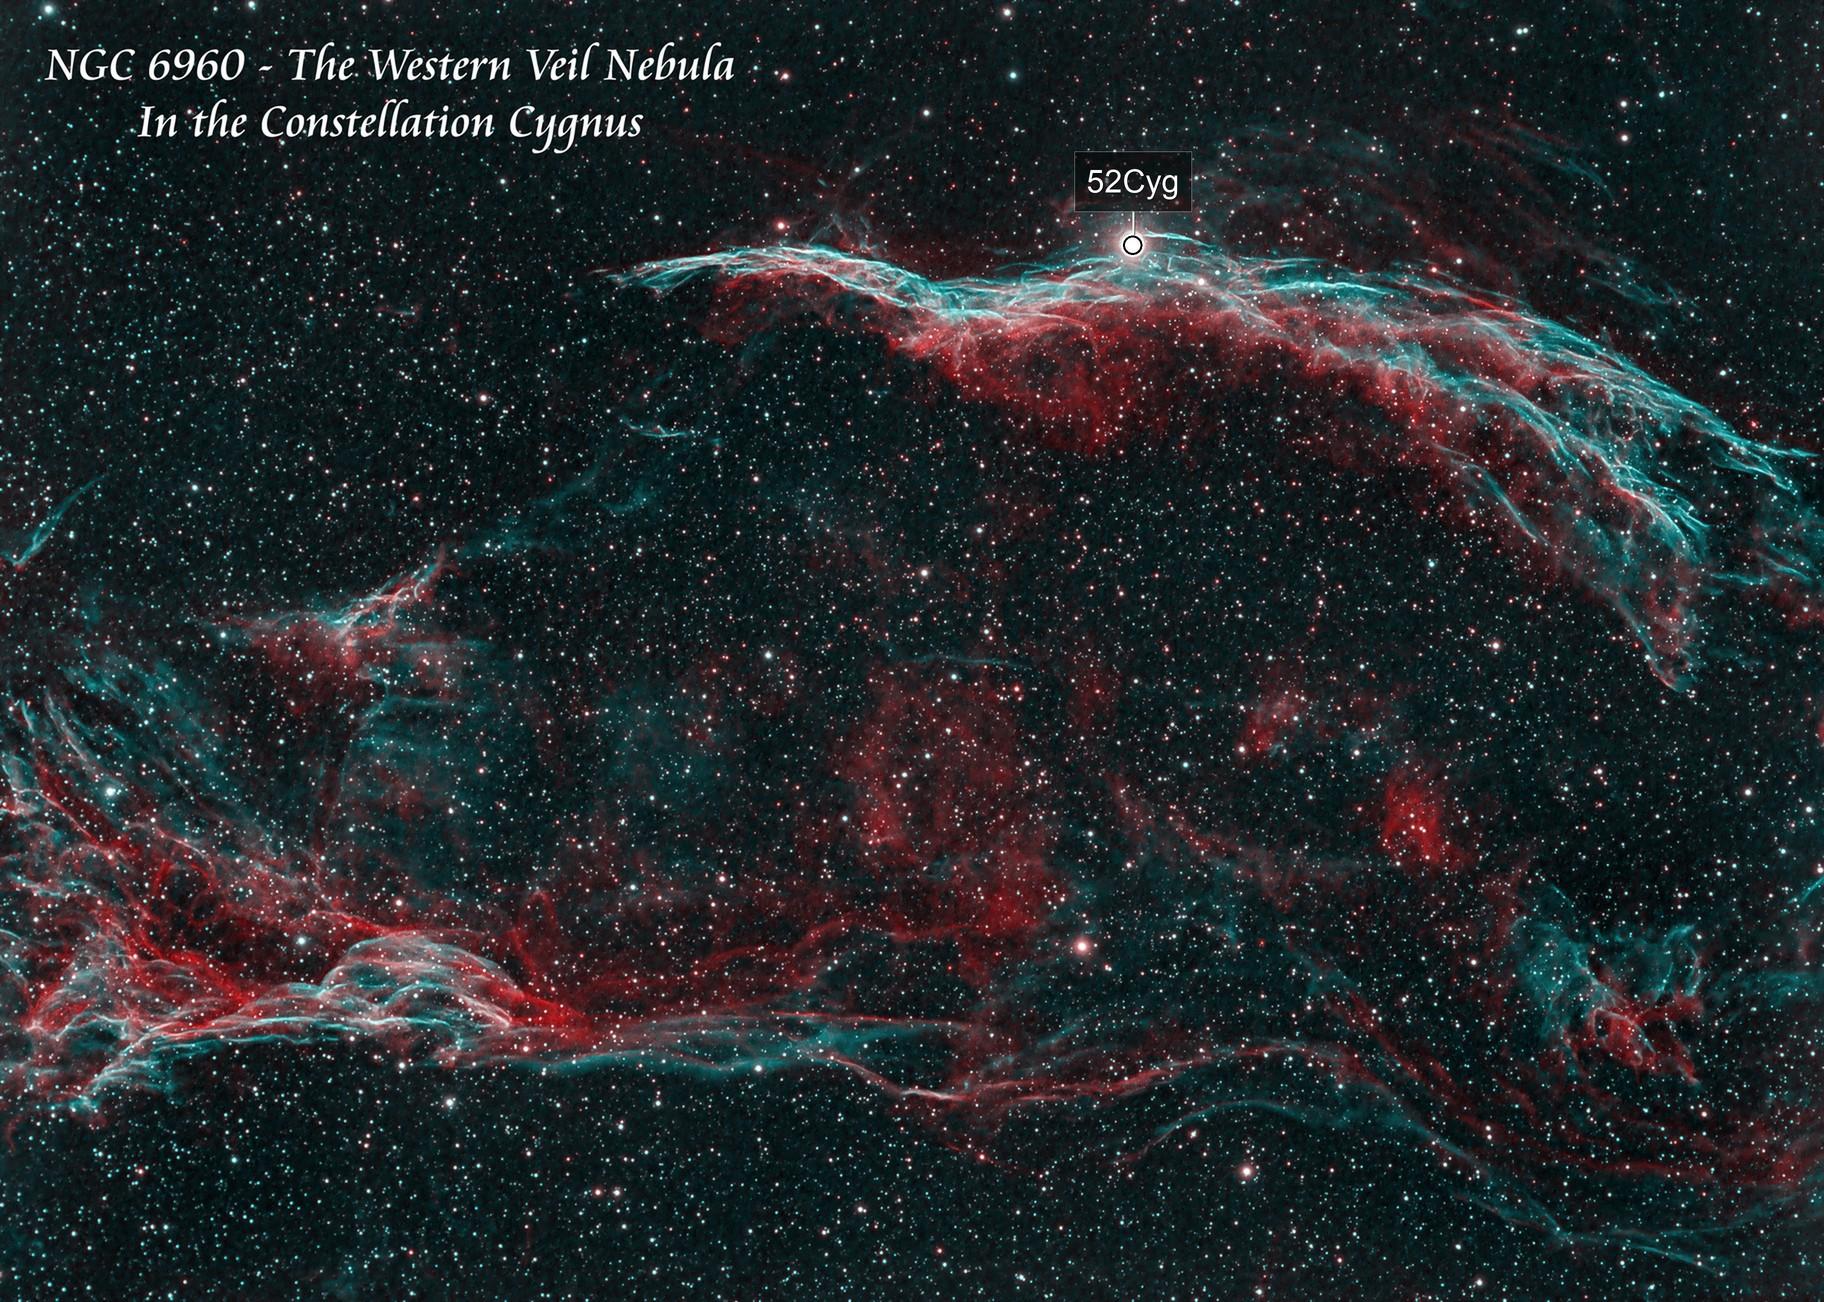 NGC 6960 The Western Veil Nebula  HOO